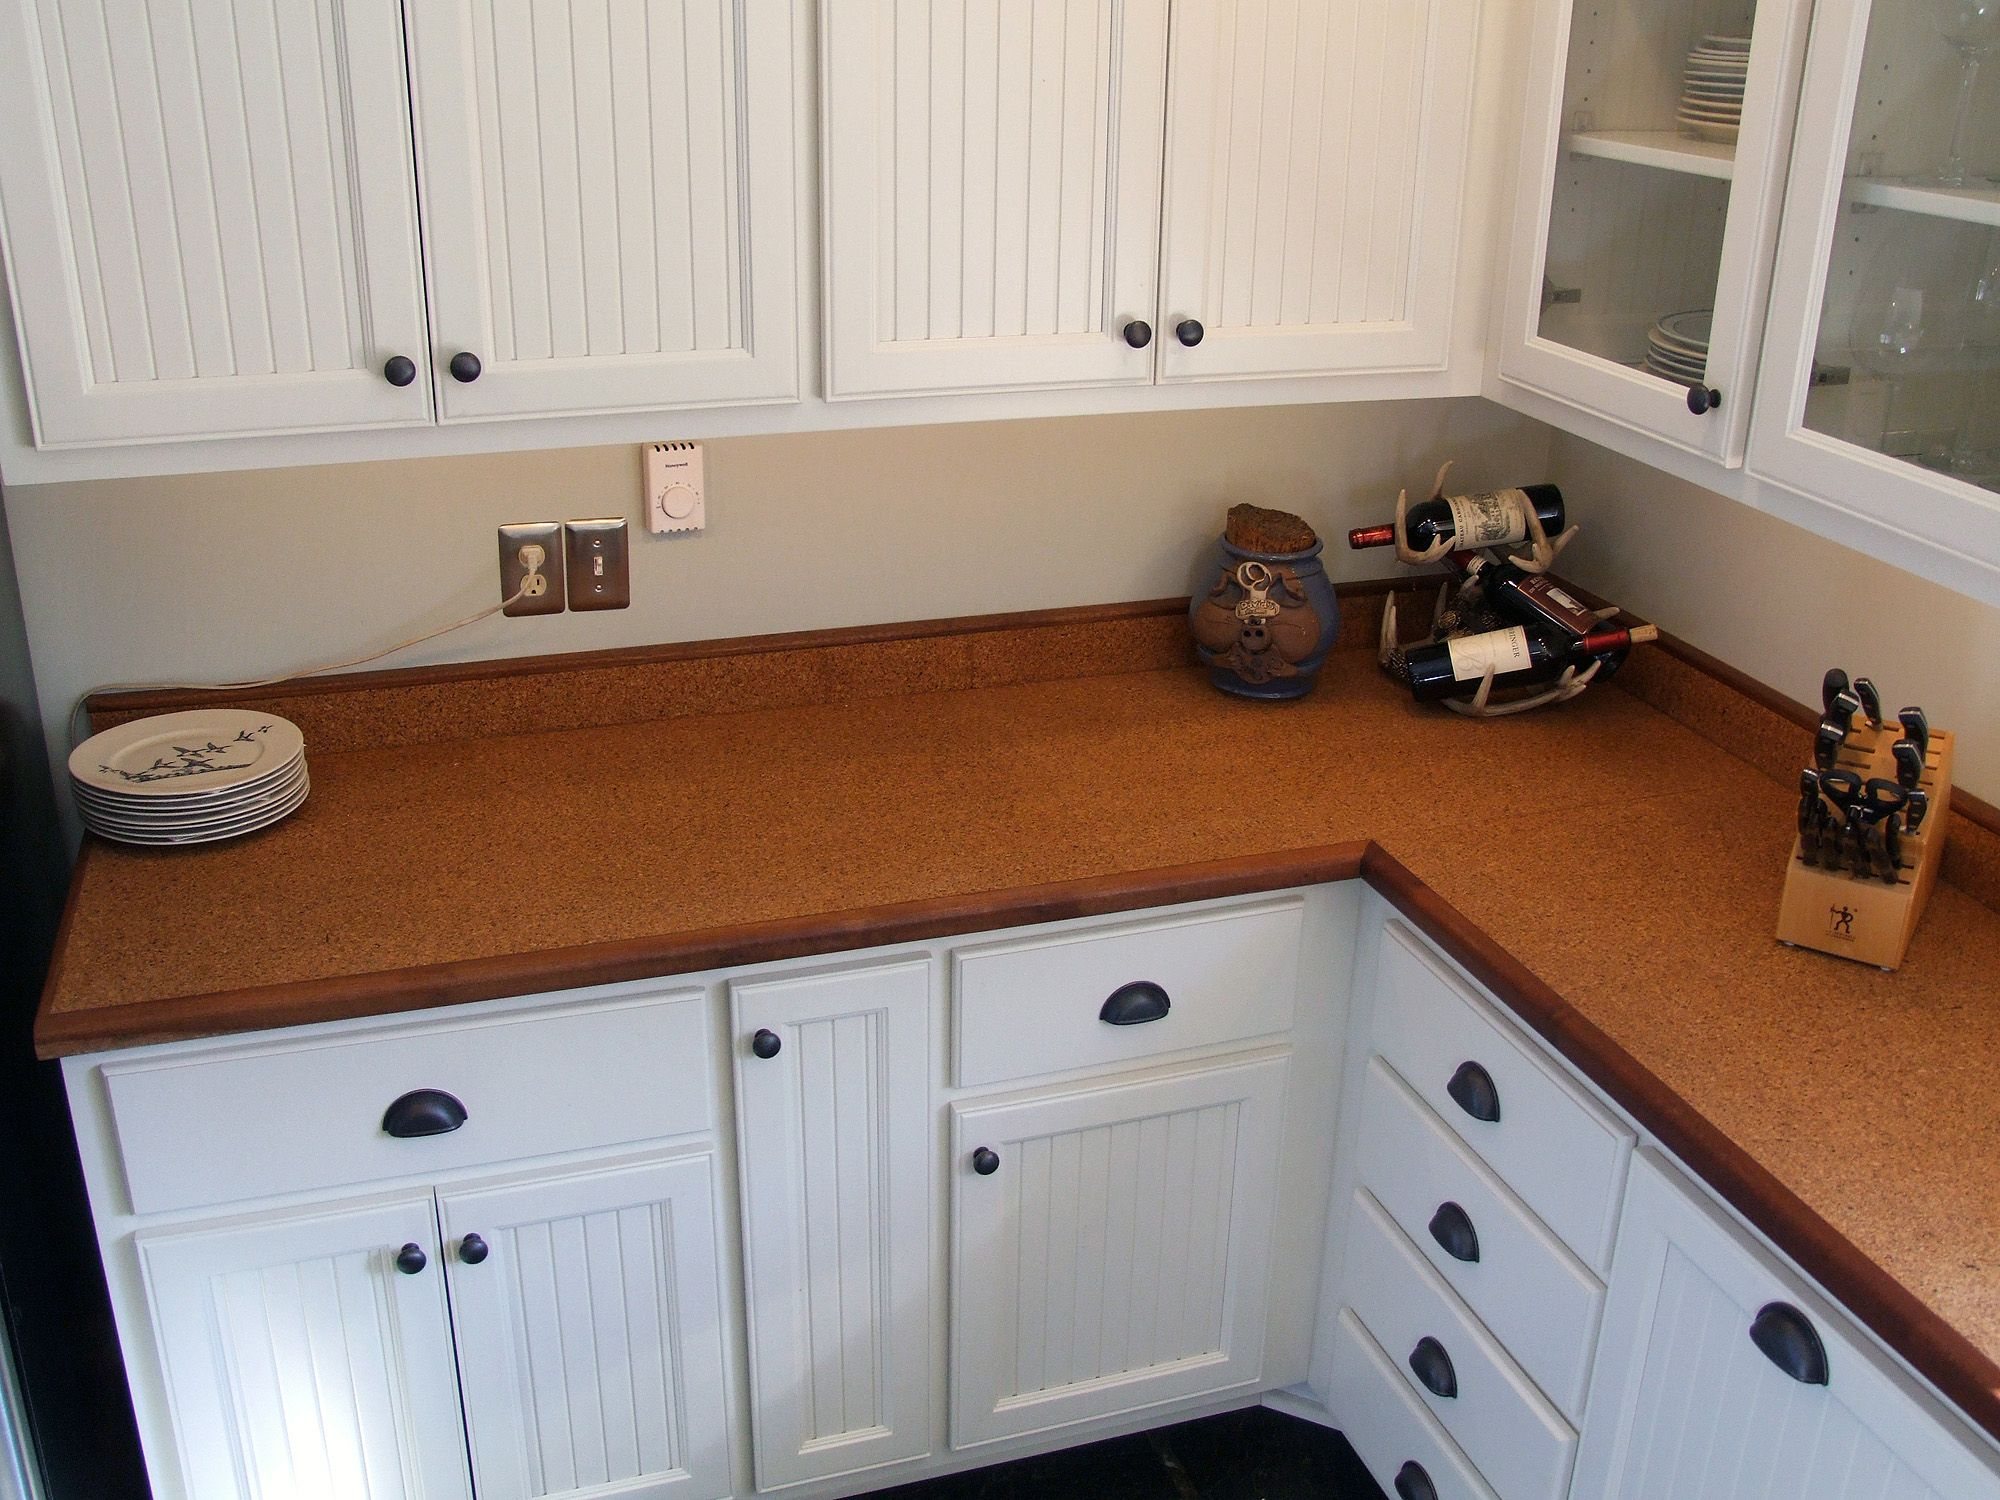 Suberra Residential Kitchen Countertop